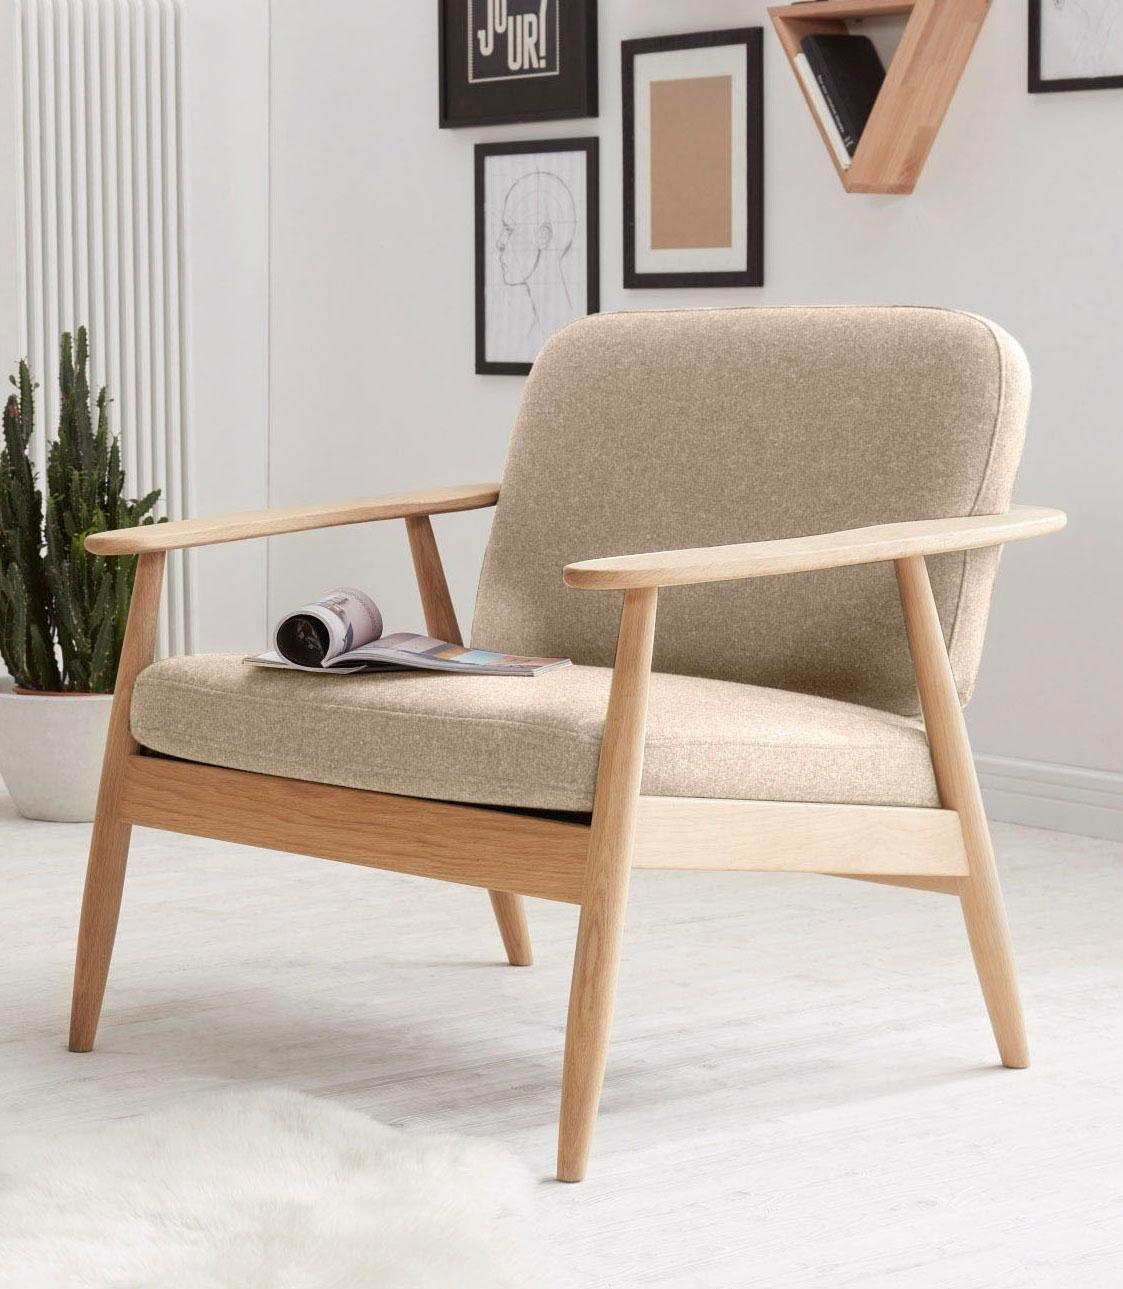 Andas fauteuil »Farsund«, designed by Anders Nørgaard in de webshop van OTTO kopen